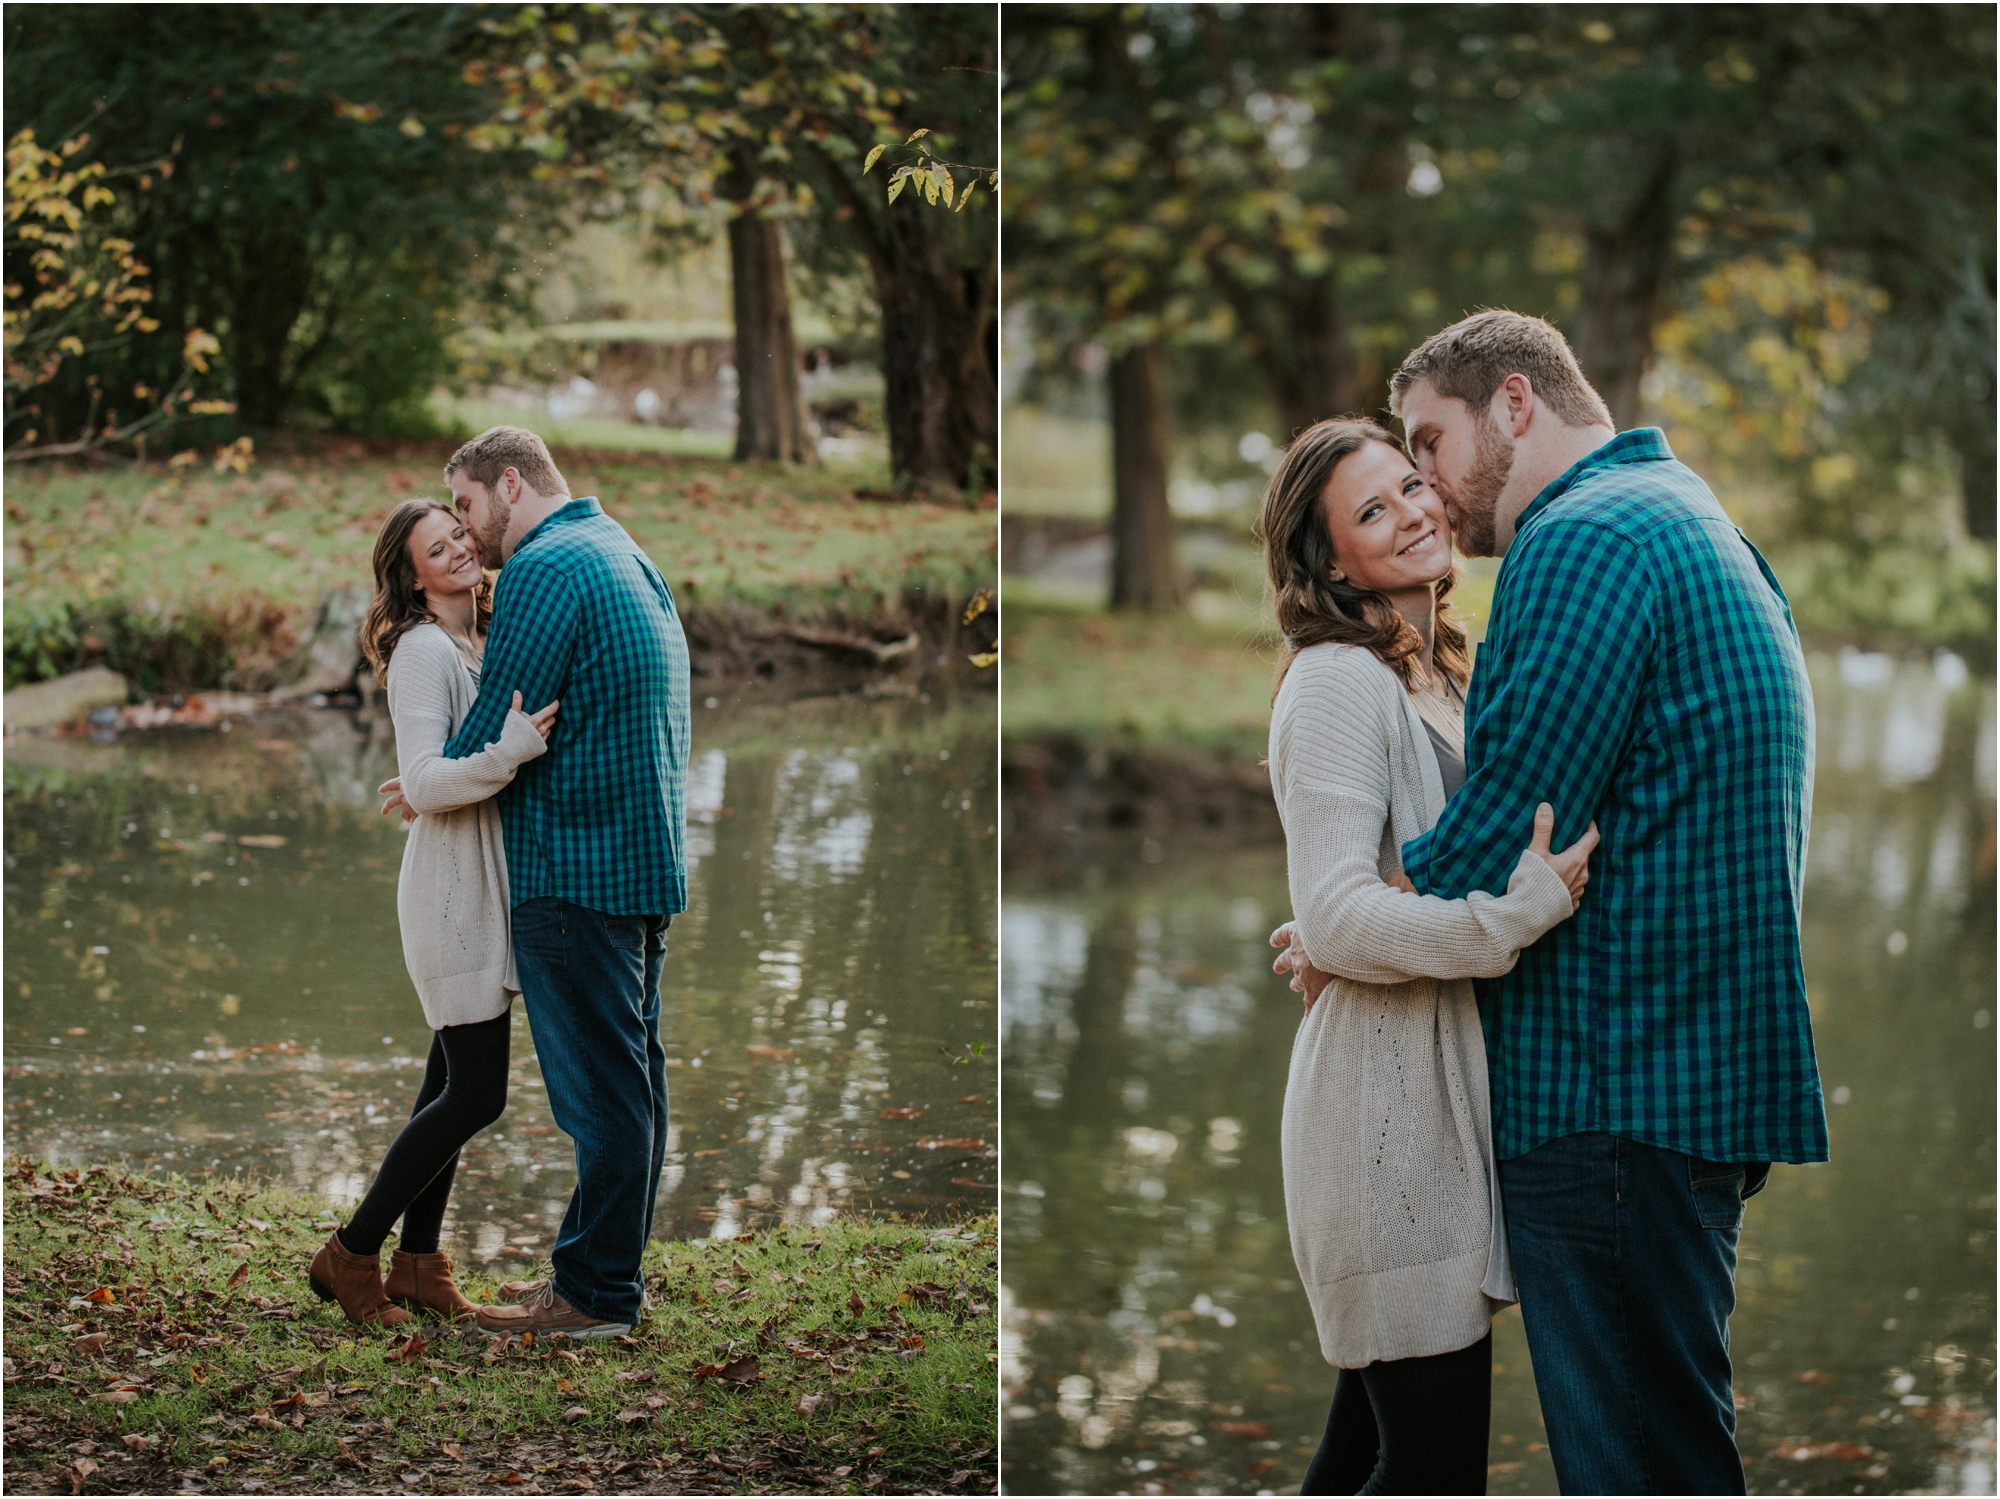 katy-sergent-millstone-limestone-tn-rustic-fall-engagement-session-adventurous-outdoors-intimate-elopement-wedding-northeast-johnson-city-photographer_0011.jpg